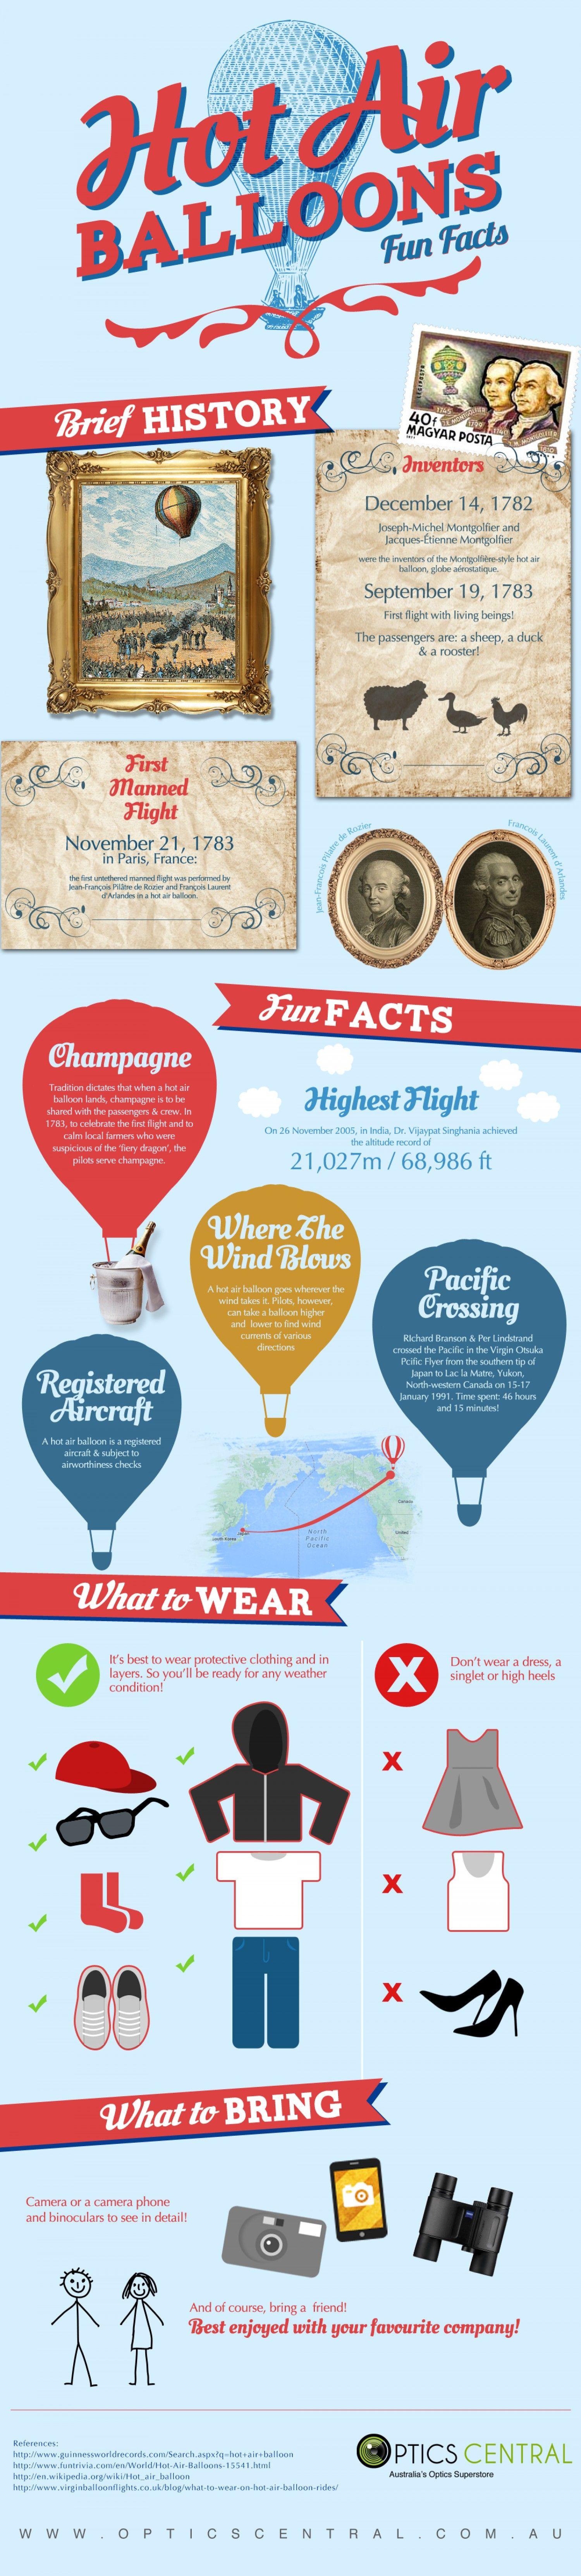 Hot Air Balloons Fun Facts Infographic Hot air balloon